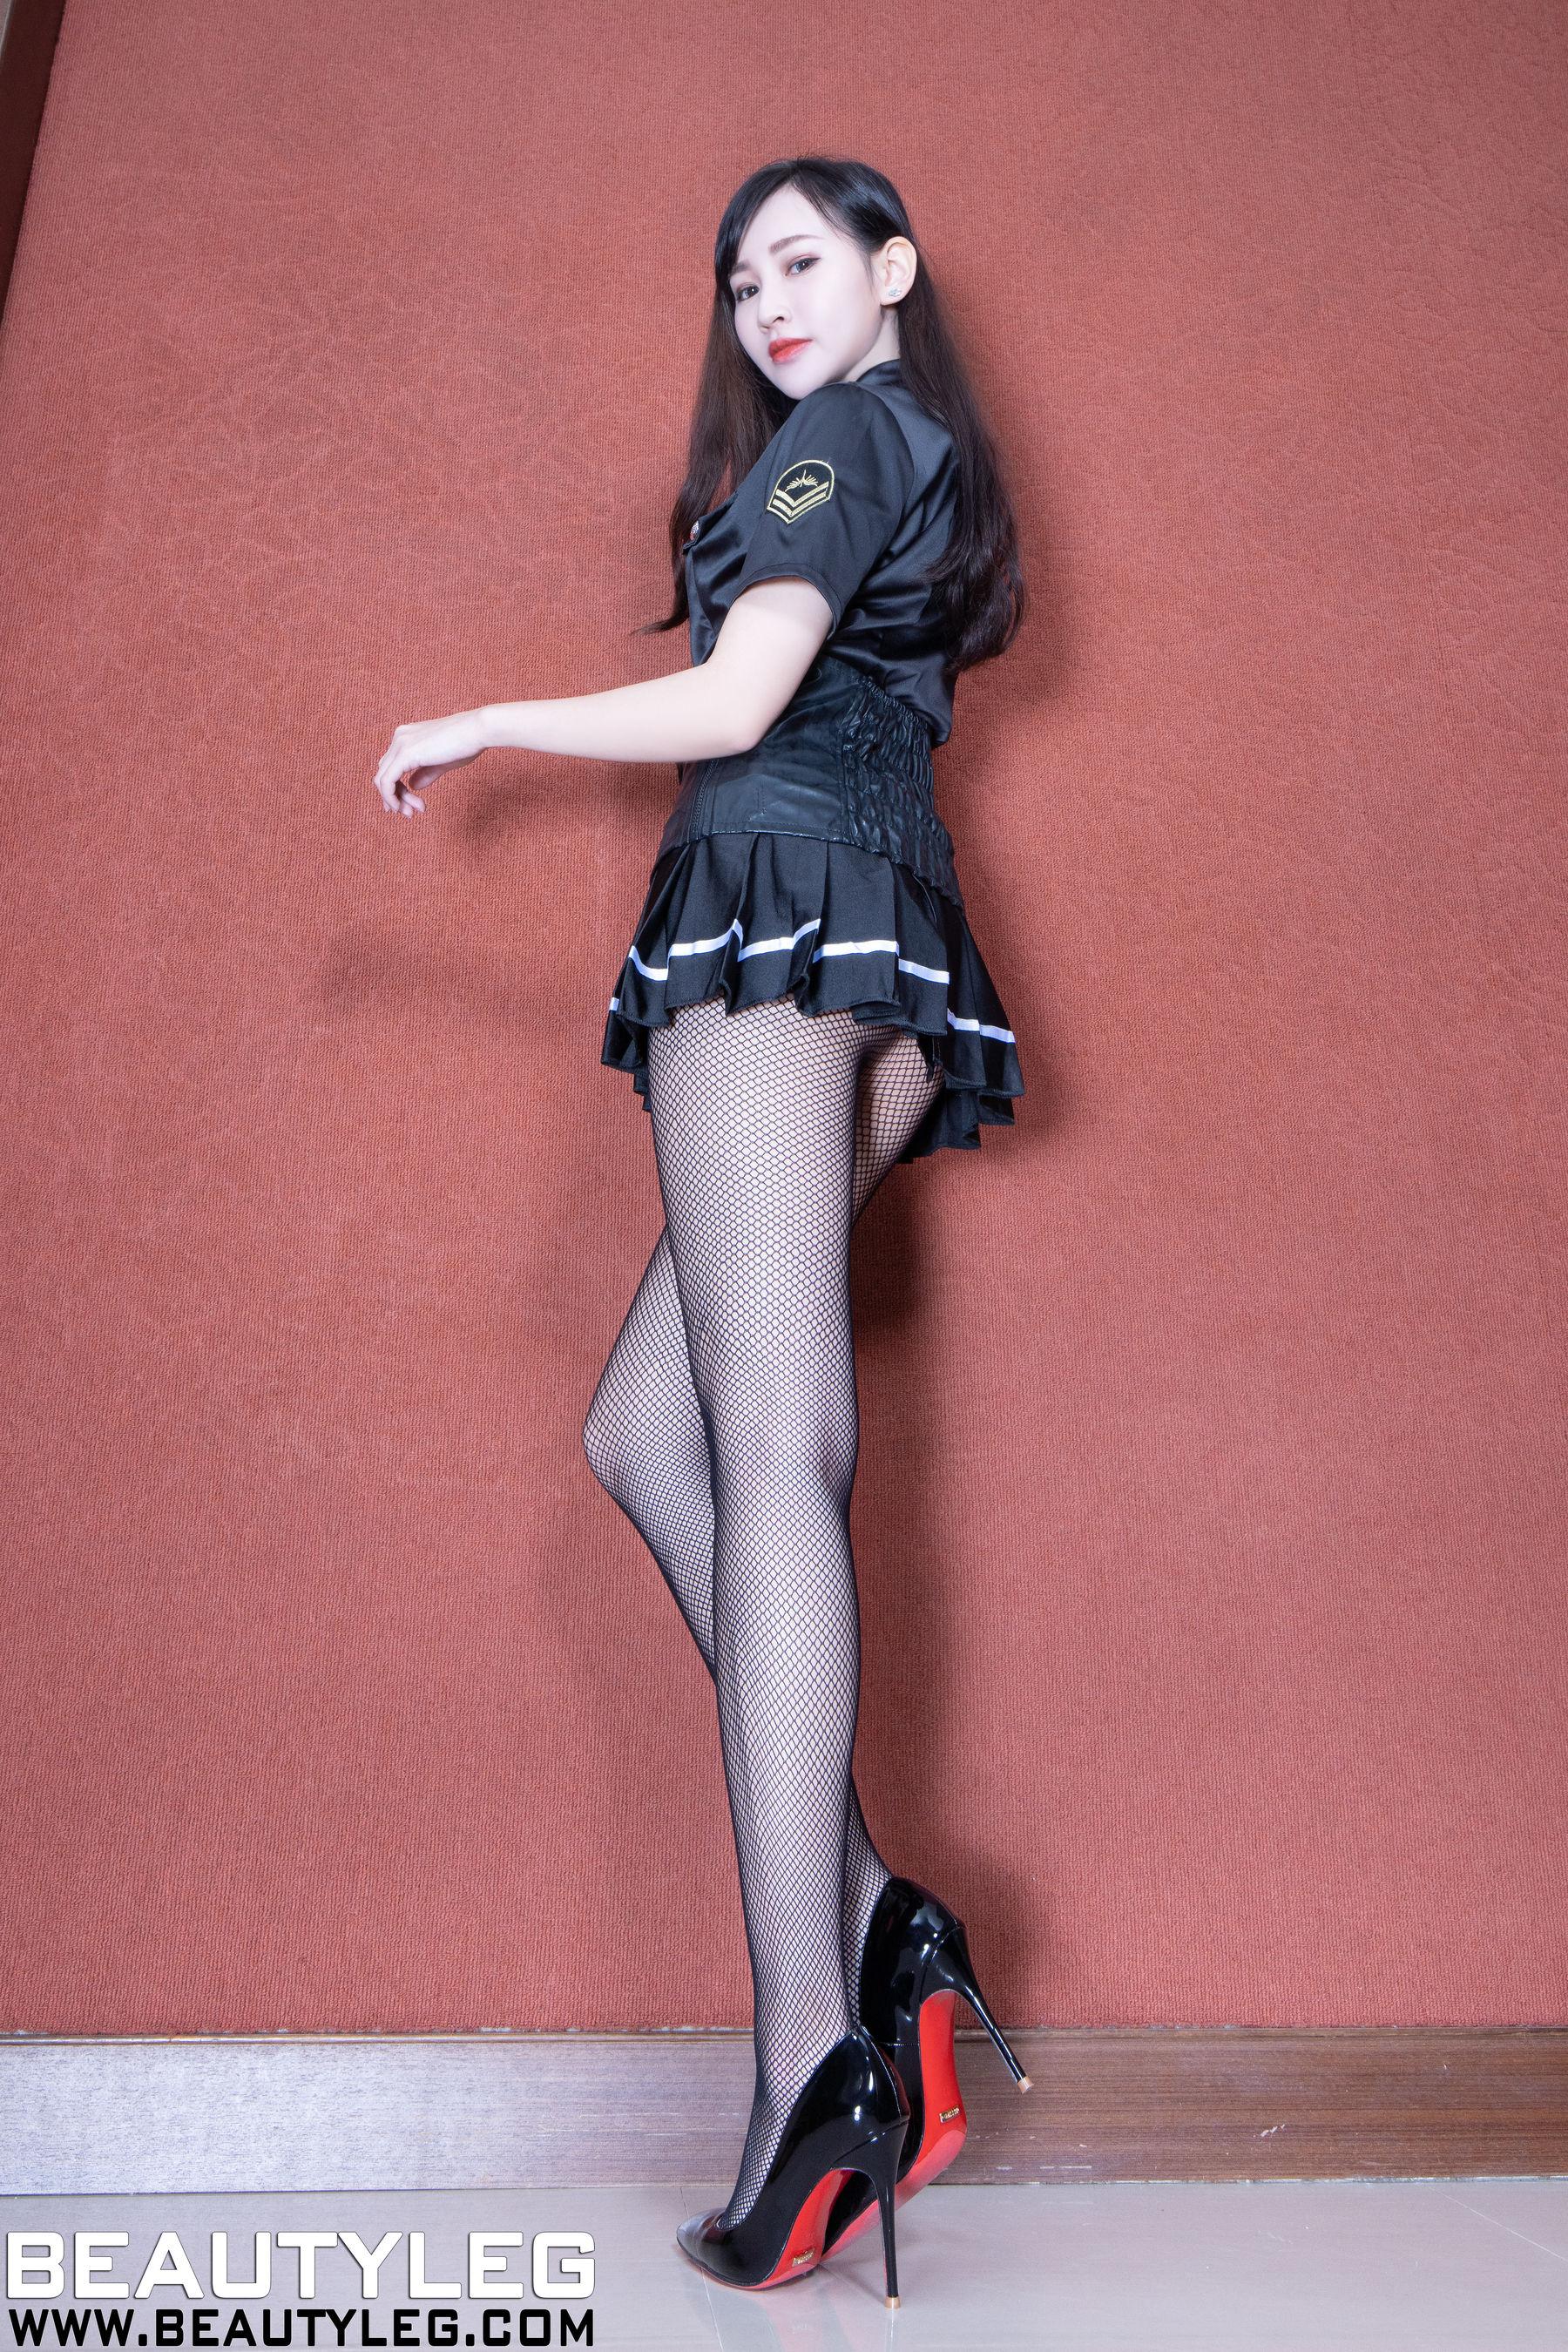 VOL.764 [Beautyleg]丝袜制服:腿模ChiChi超高清个人性感漂亮大图(38P)